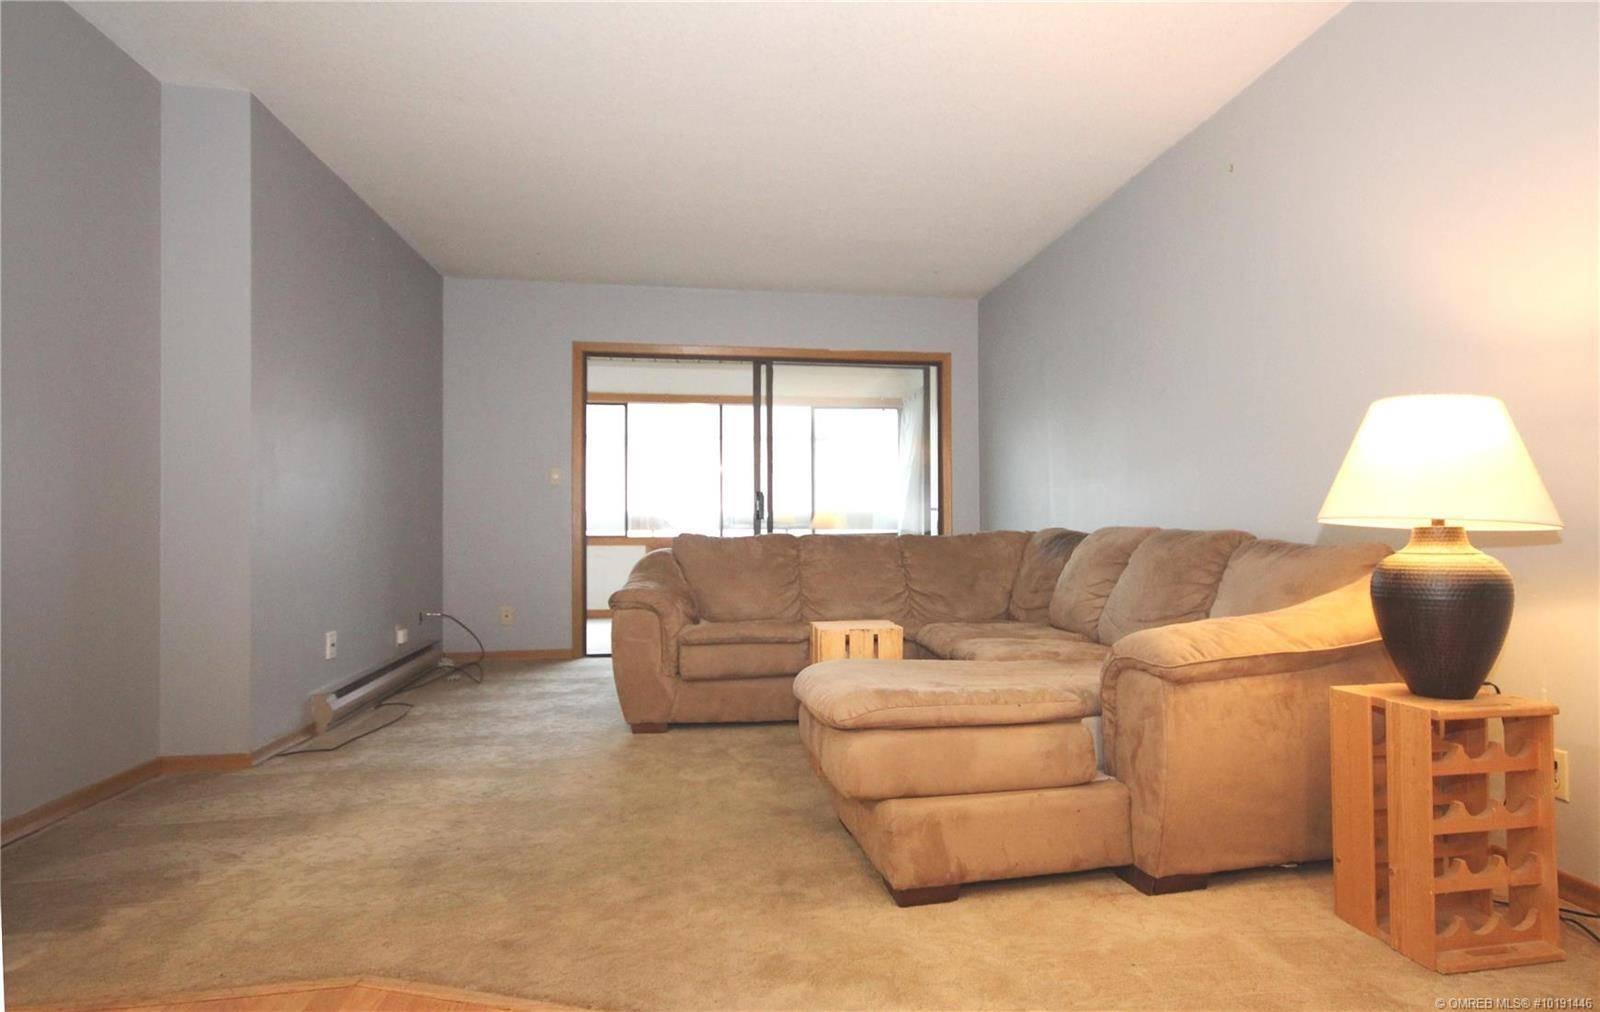 Condo for sale at 1075 Bernard Ave Unit 108 Kelowna British Columbia - MLS: 10191446